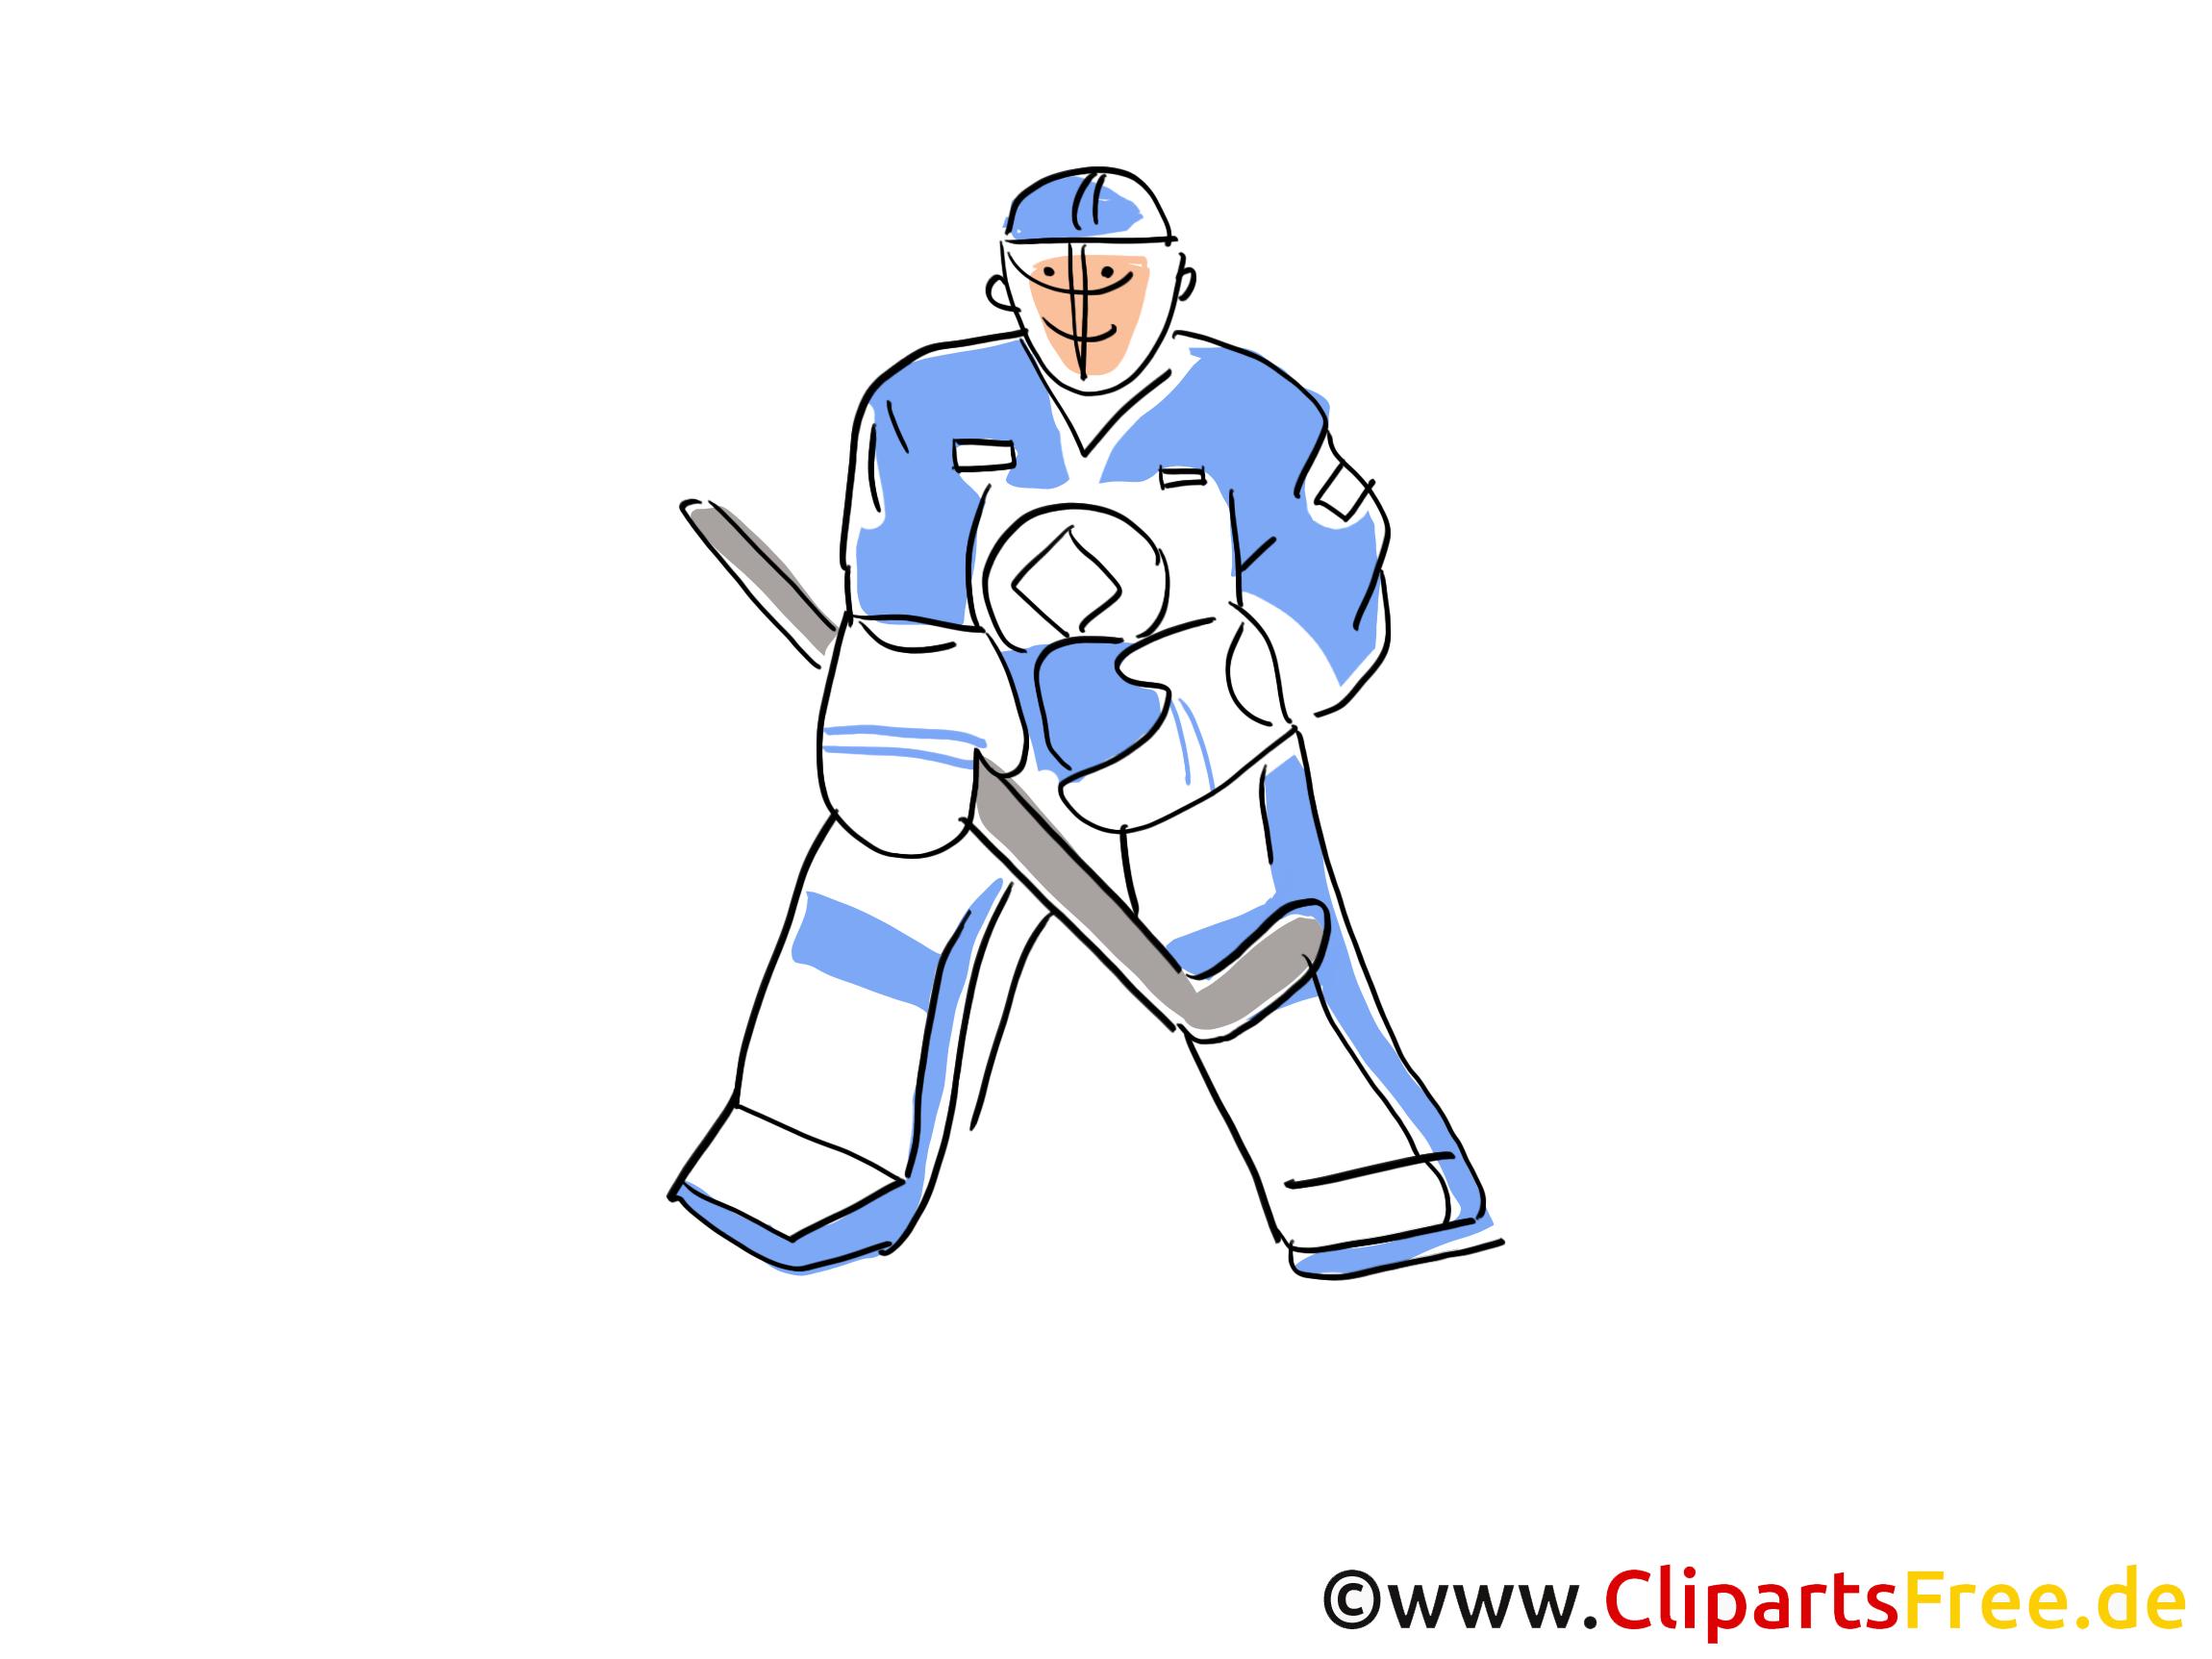 Sport d'hiver images - Hockey dessins gratuits